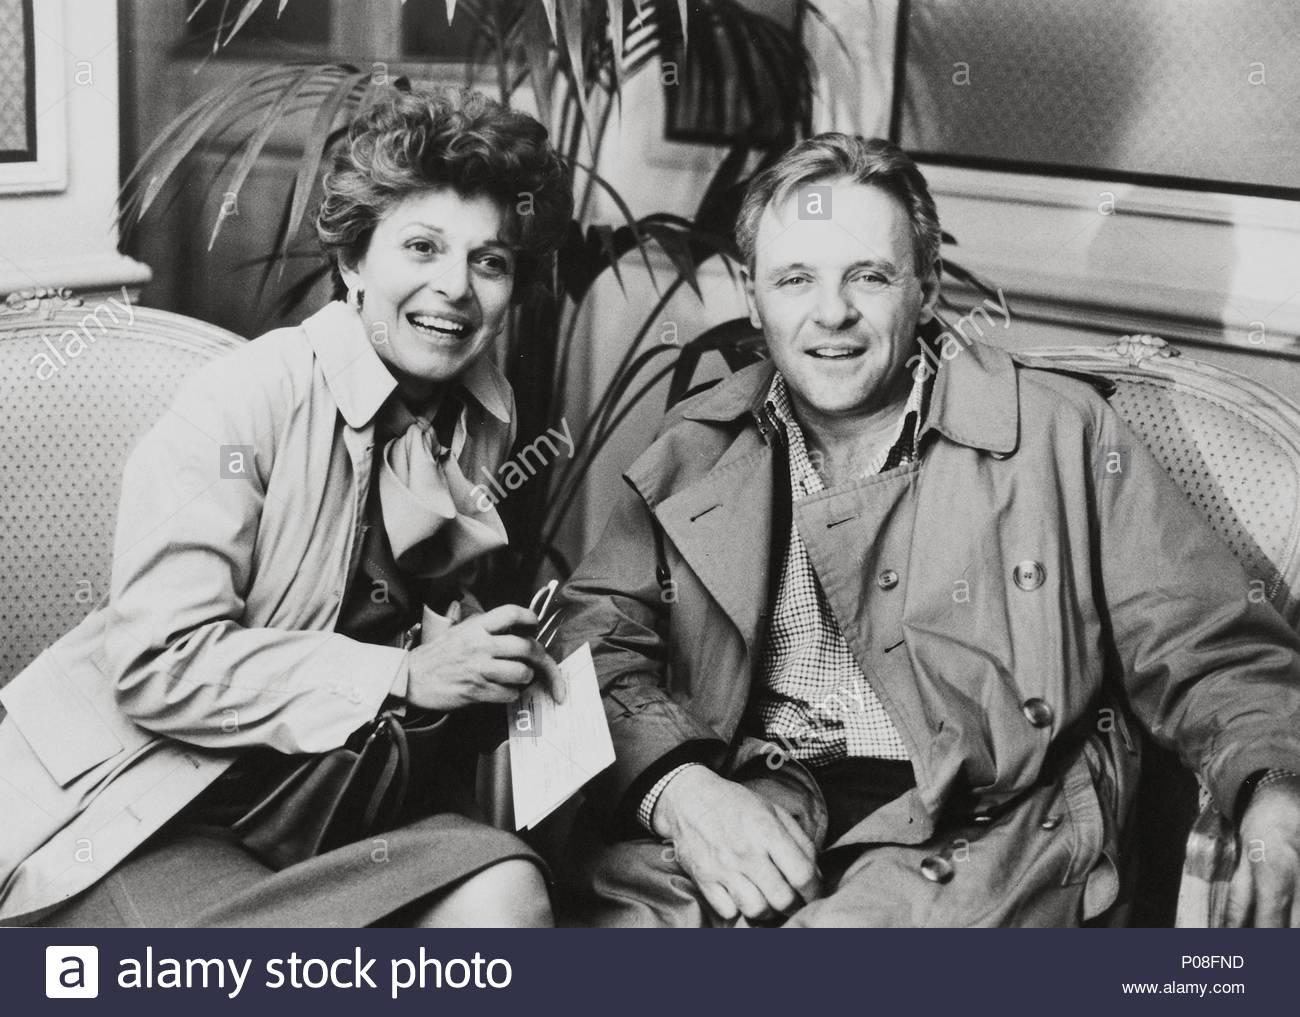 best service 7c9bc added Original Film Title  84 CHARING CROSS ROAD. English Title  84 CHARING CROSS  ROAD. Film Director  DAVID HUGH JONES. Year  1987. Stars  ANNE BANCROFT   ANTHONY ...